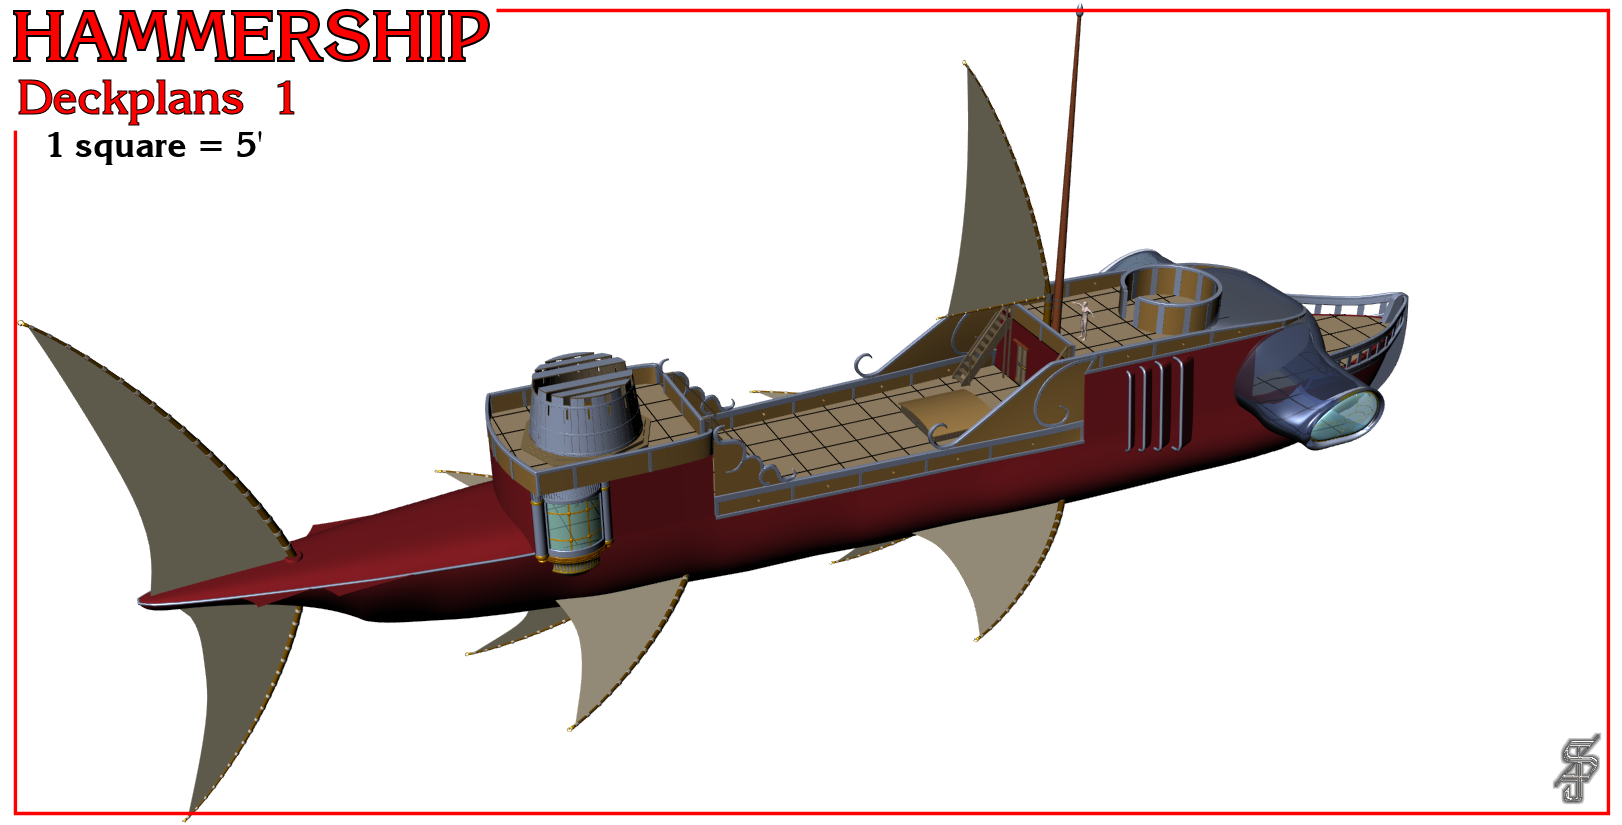 Hammership layout 1